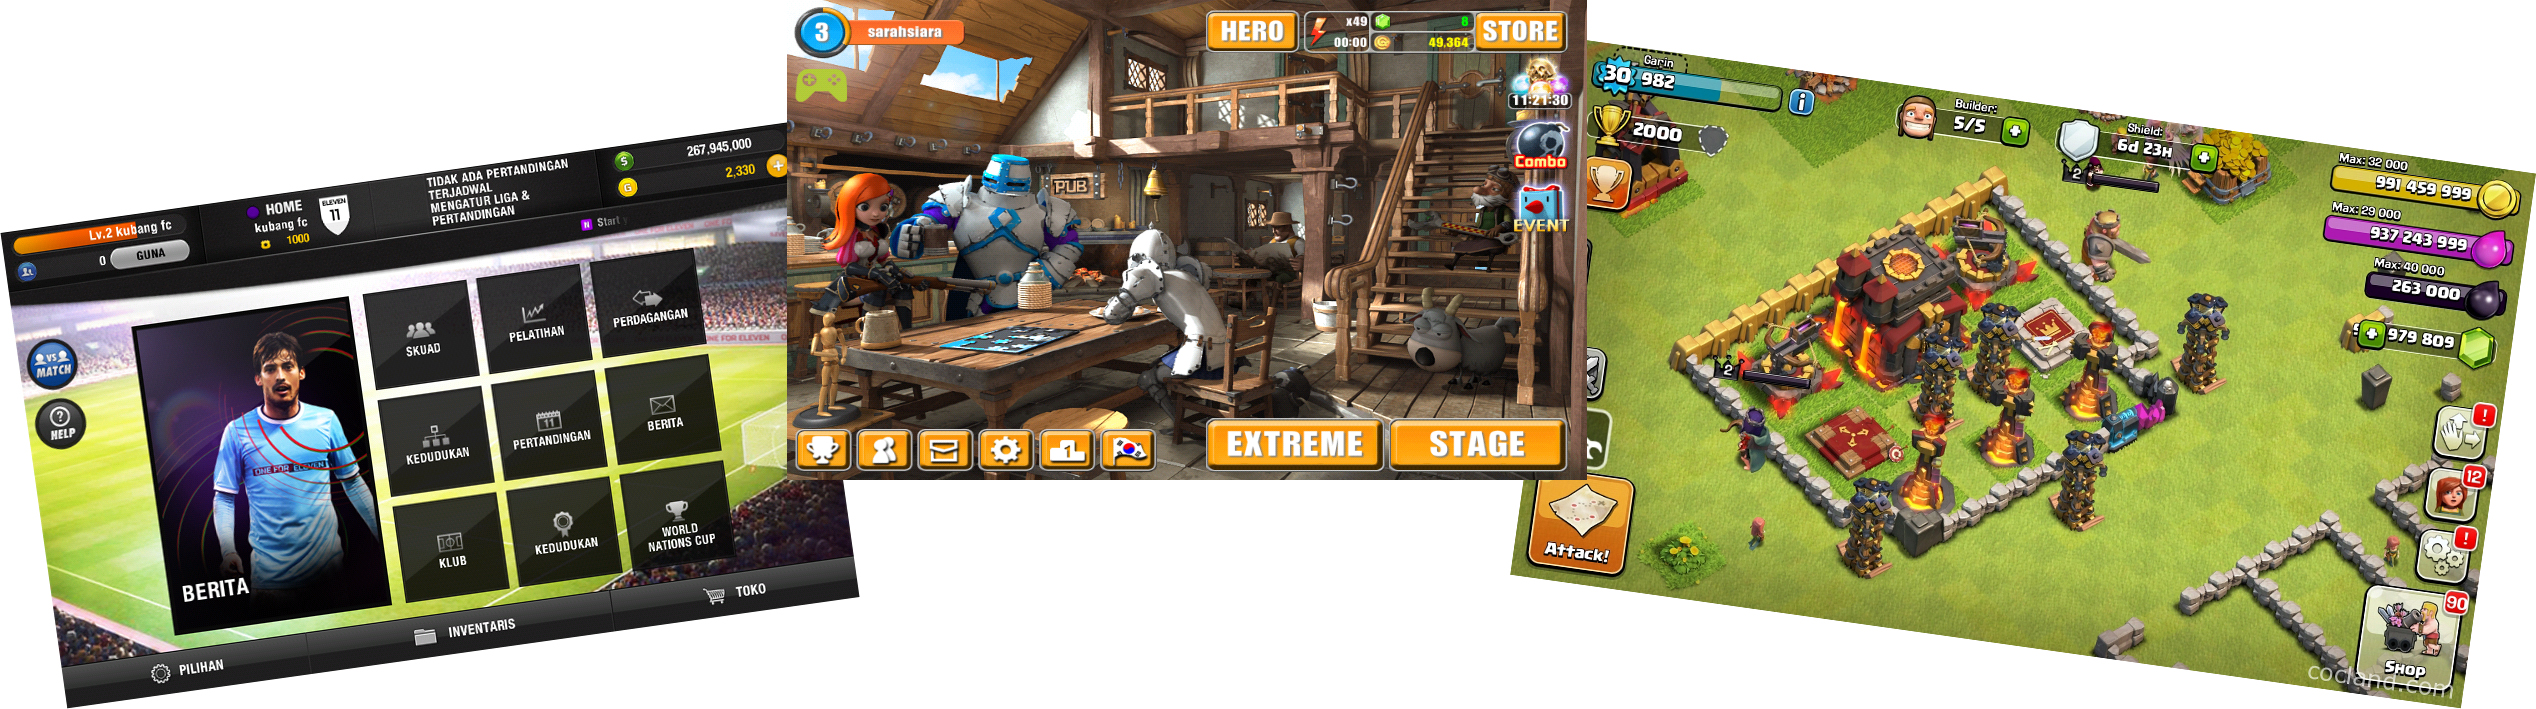 Ilustrasi game pada Android. Kiri: One for Eleven (sumber: koleksi pribadi), tengah: OnionKnight (sumber: koleksi pribadi), kanan: Clash of Clans (sumber: http://cocland.com/tutorials/create-clash-clans-private-server)